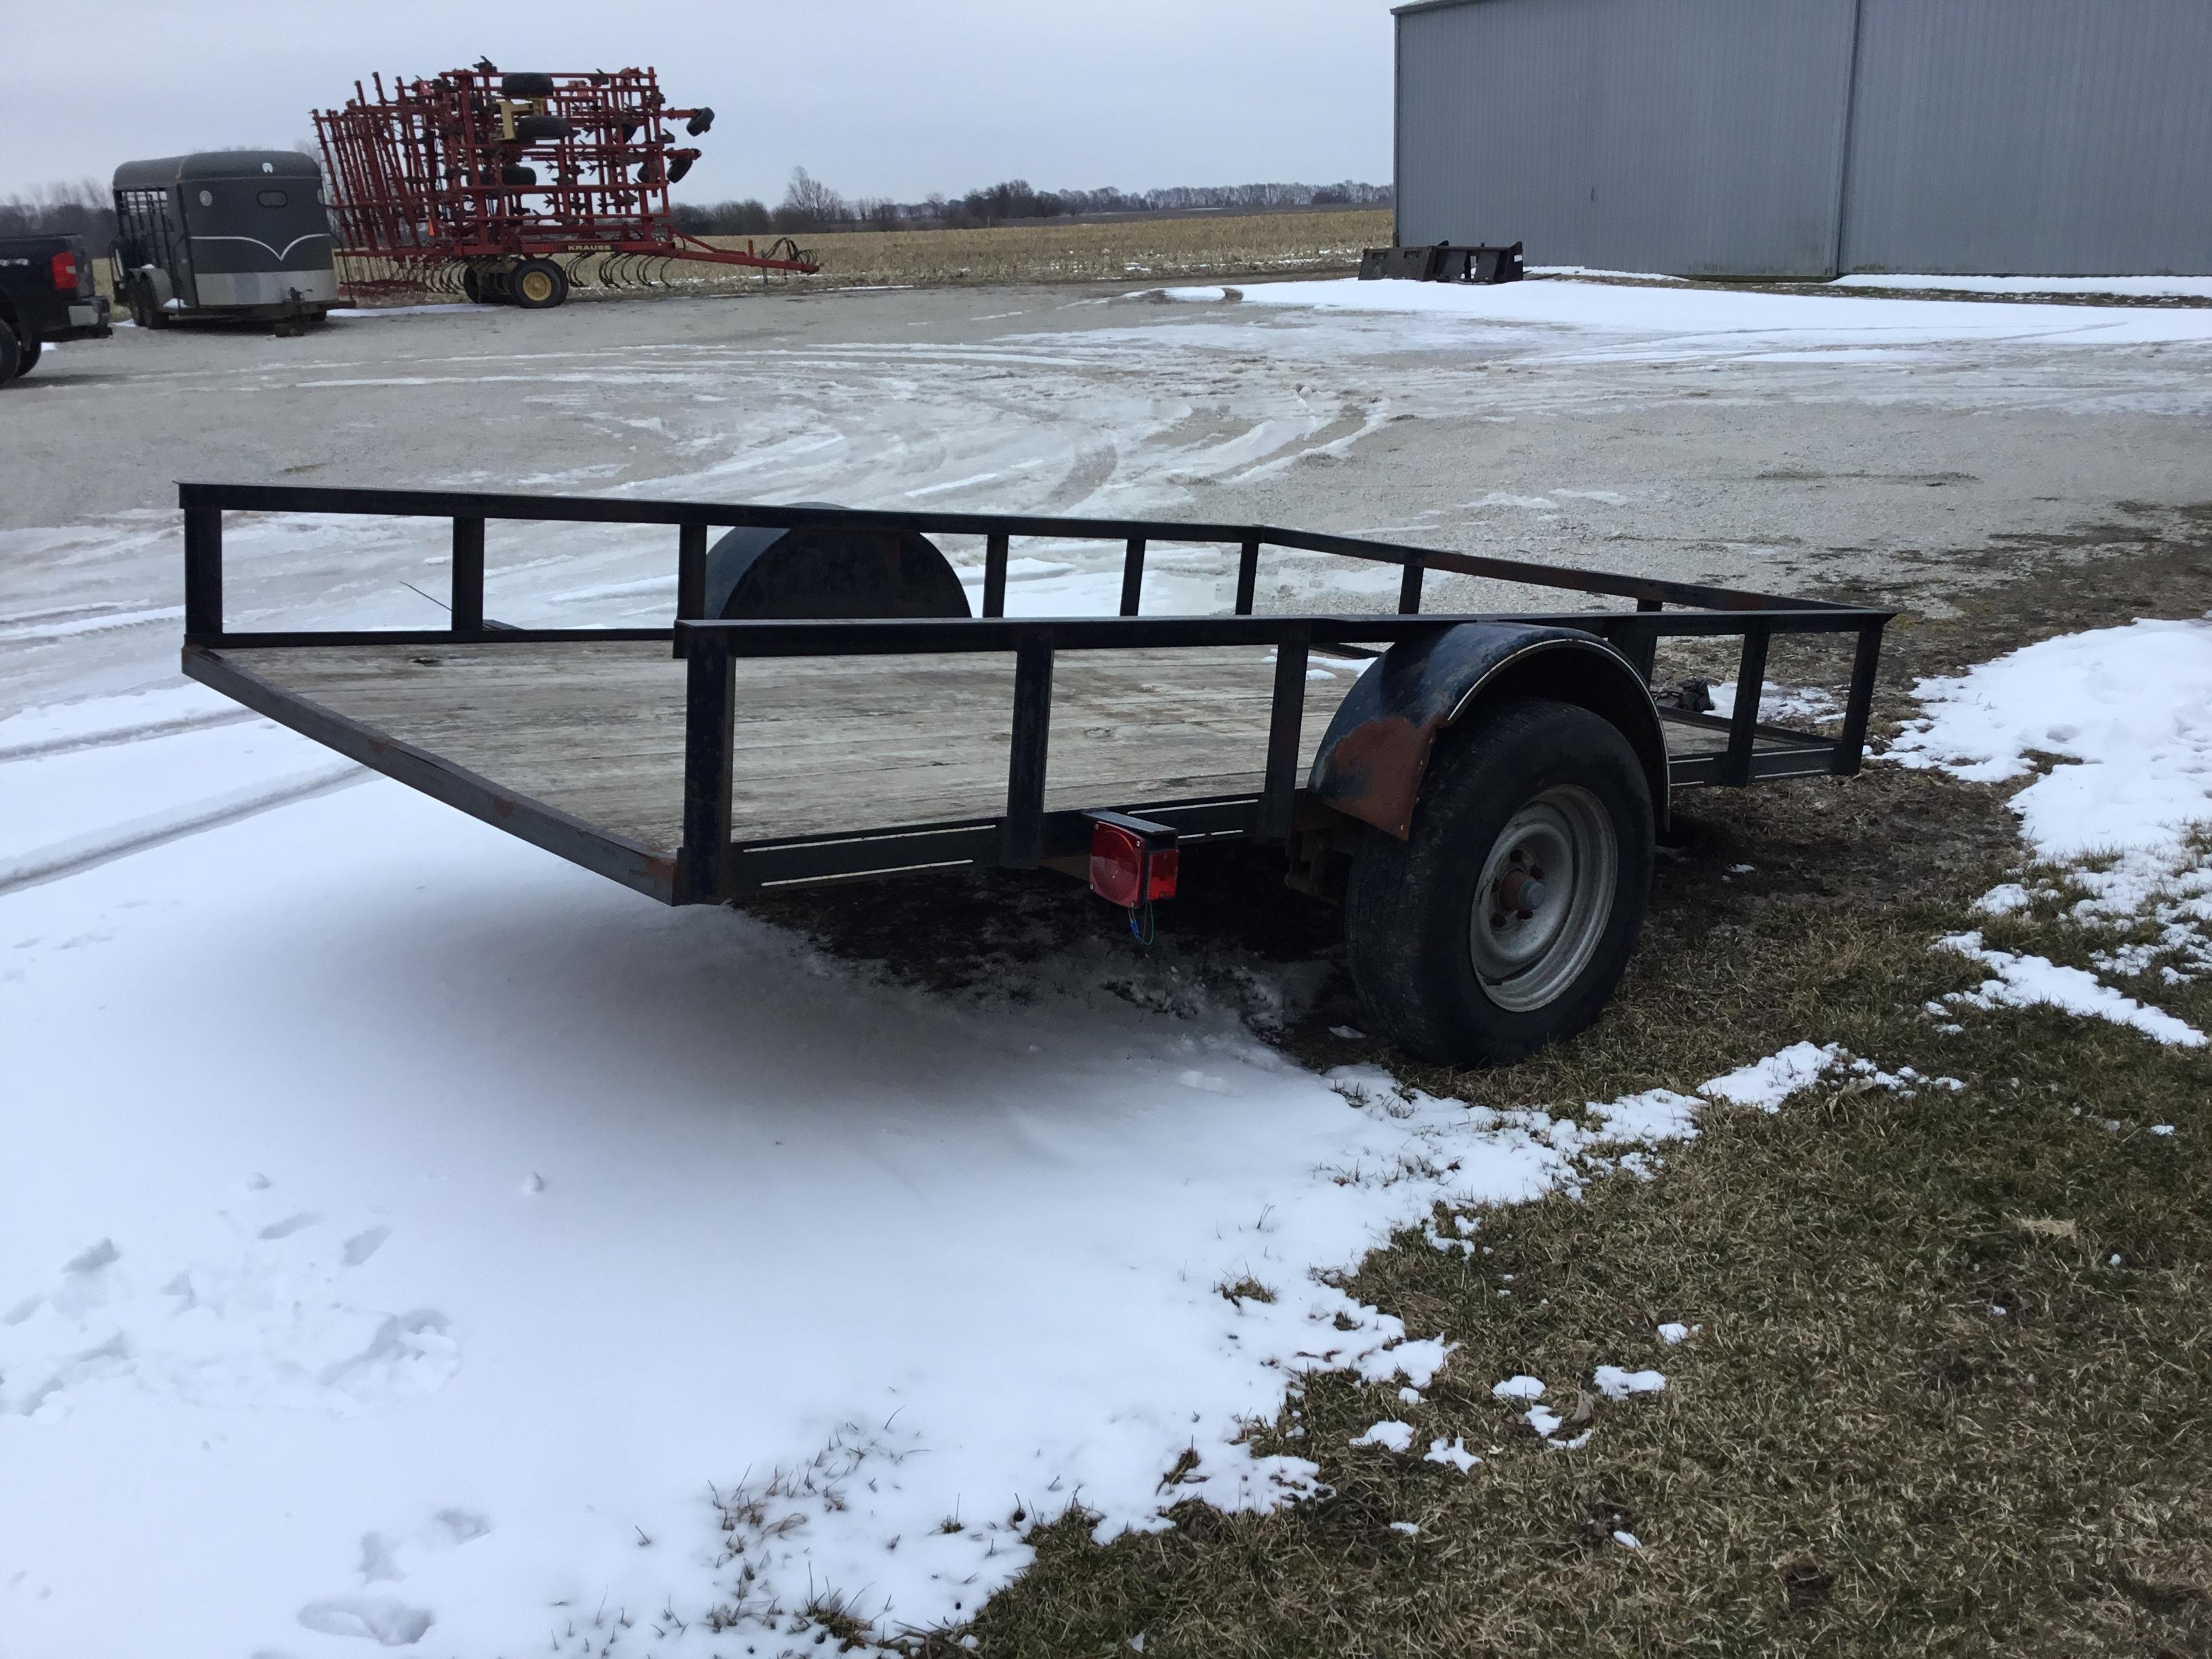 Lot 25 - Utility Trailer, Single Axle, Tilt Bed